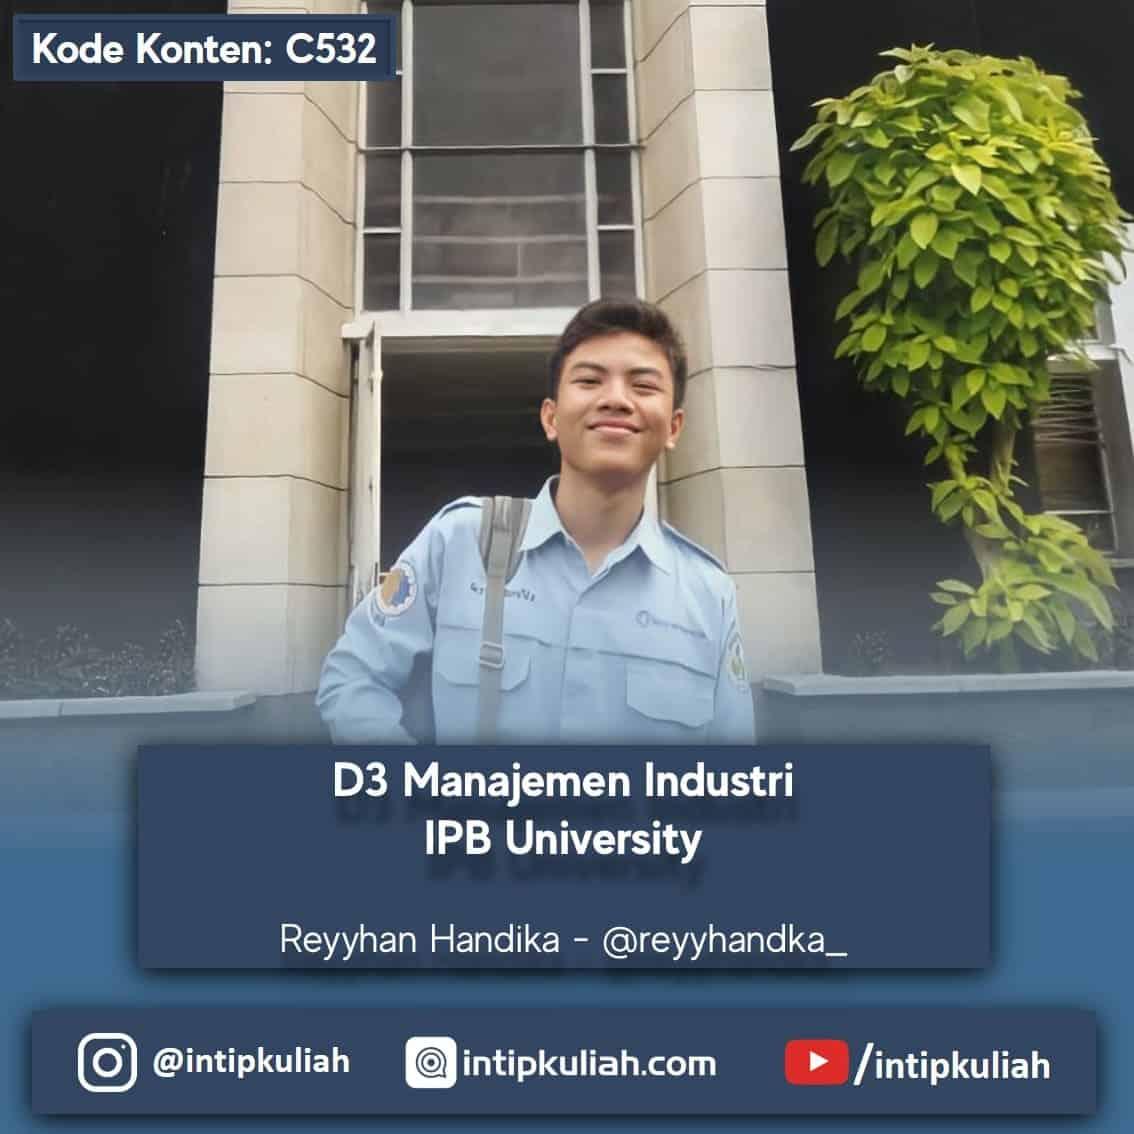 D3 Manajemen Industri IPB (Reyhan)